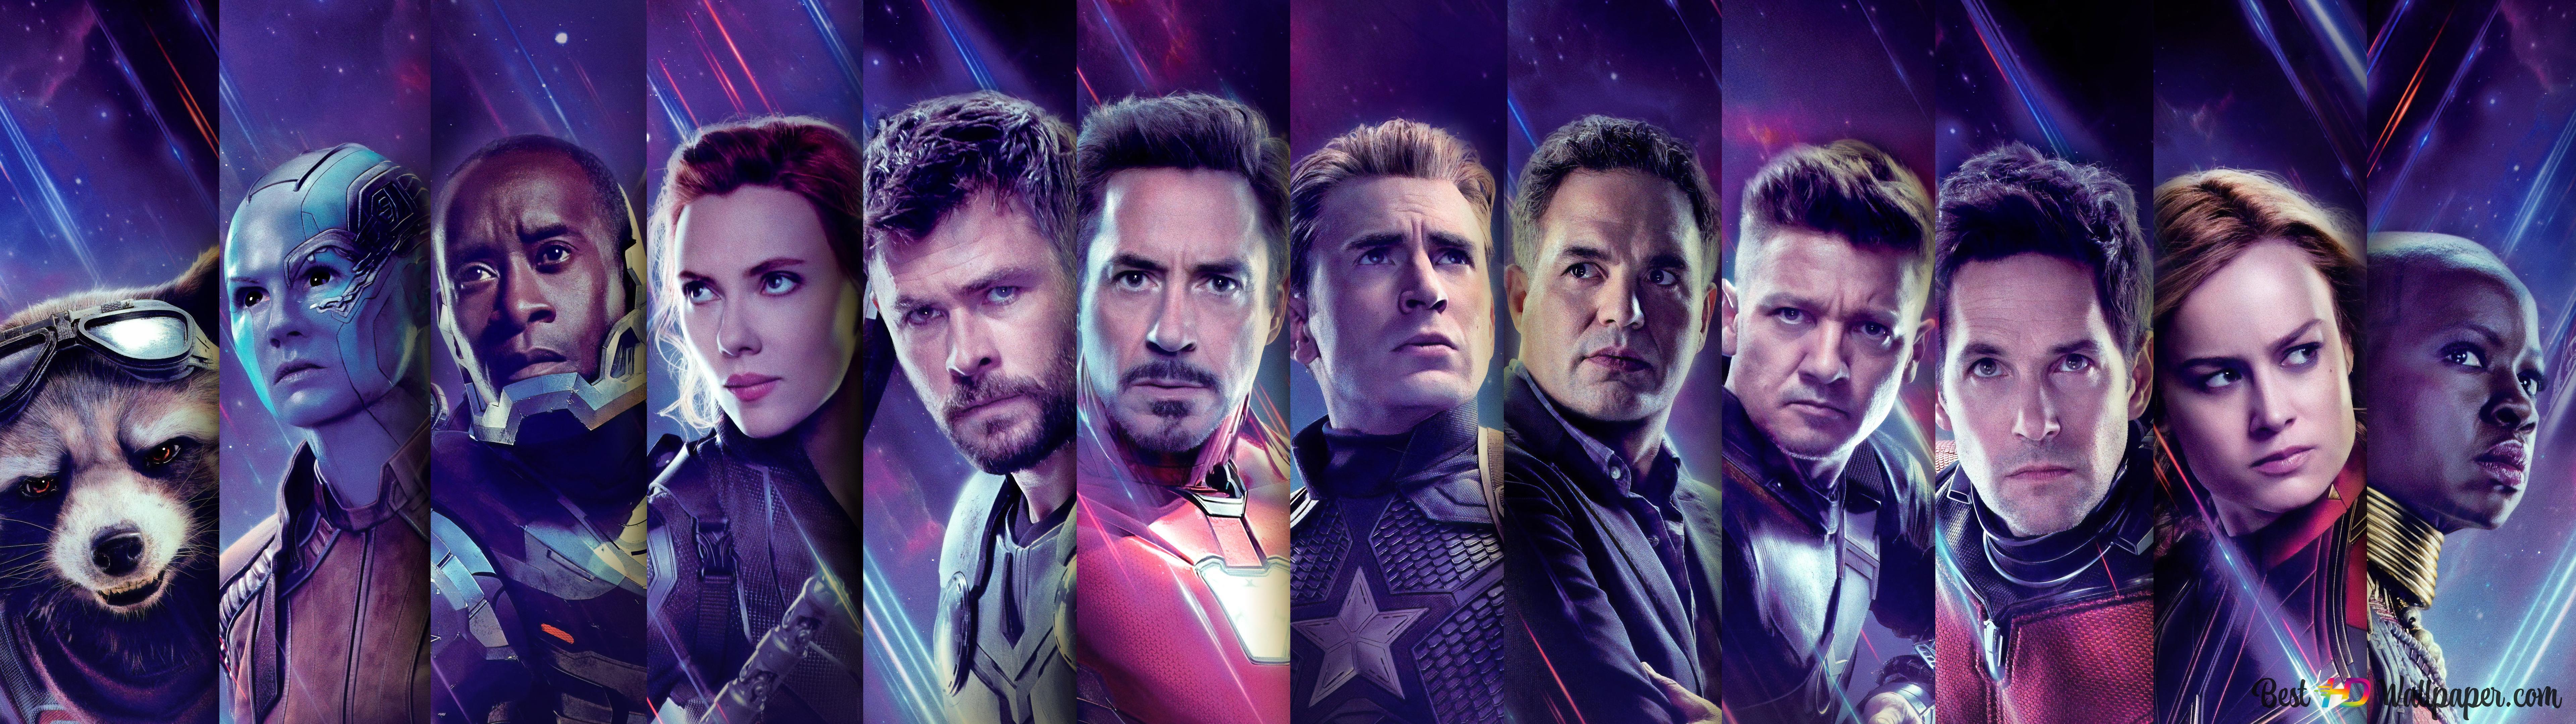 Avengers Endgame Heroes Hd Wallpaper Download